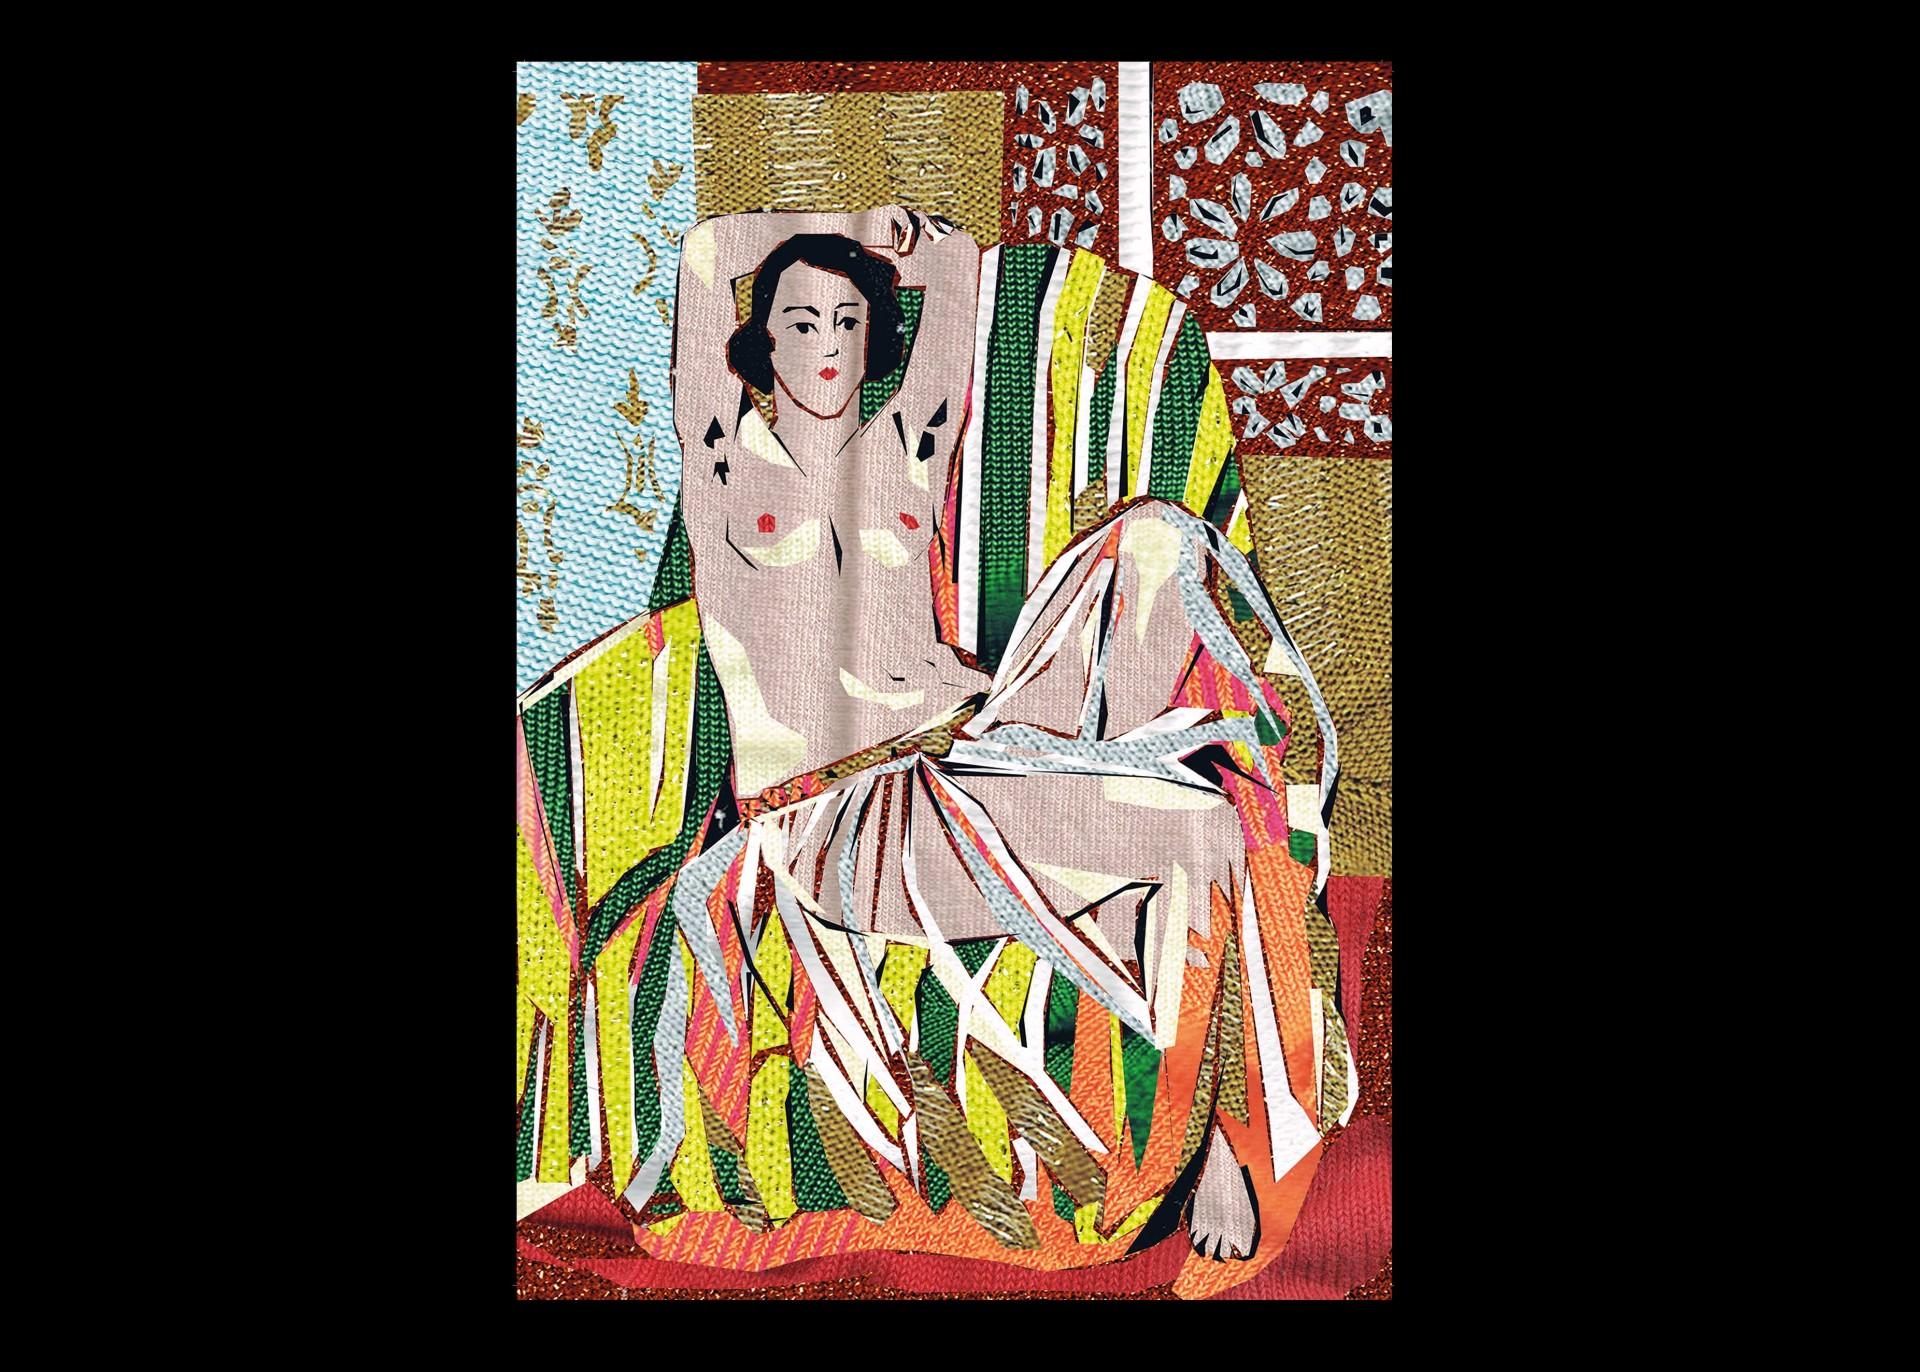 Margot Vanhassel Matisse Socks